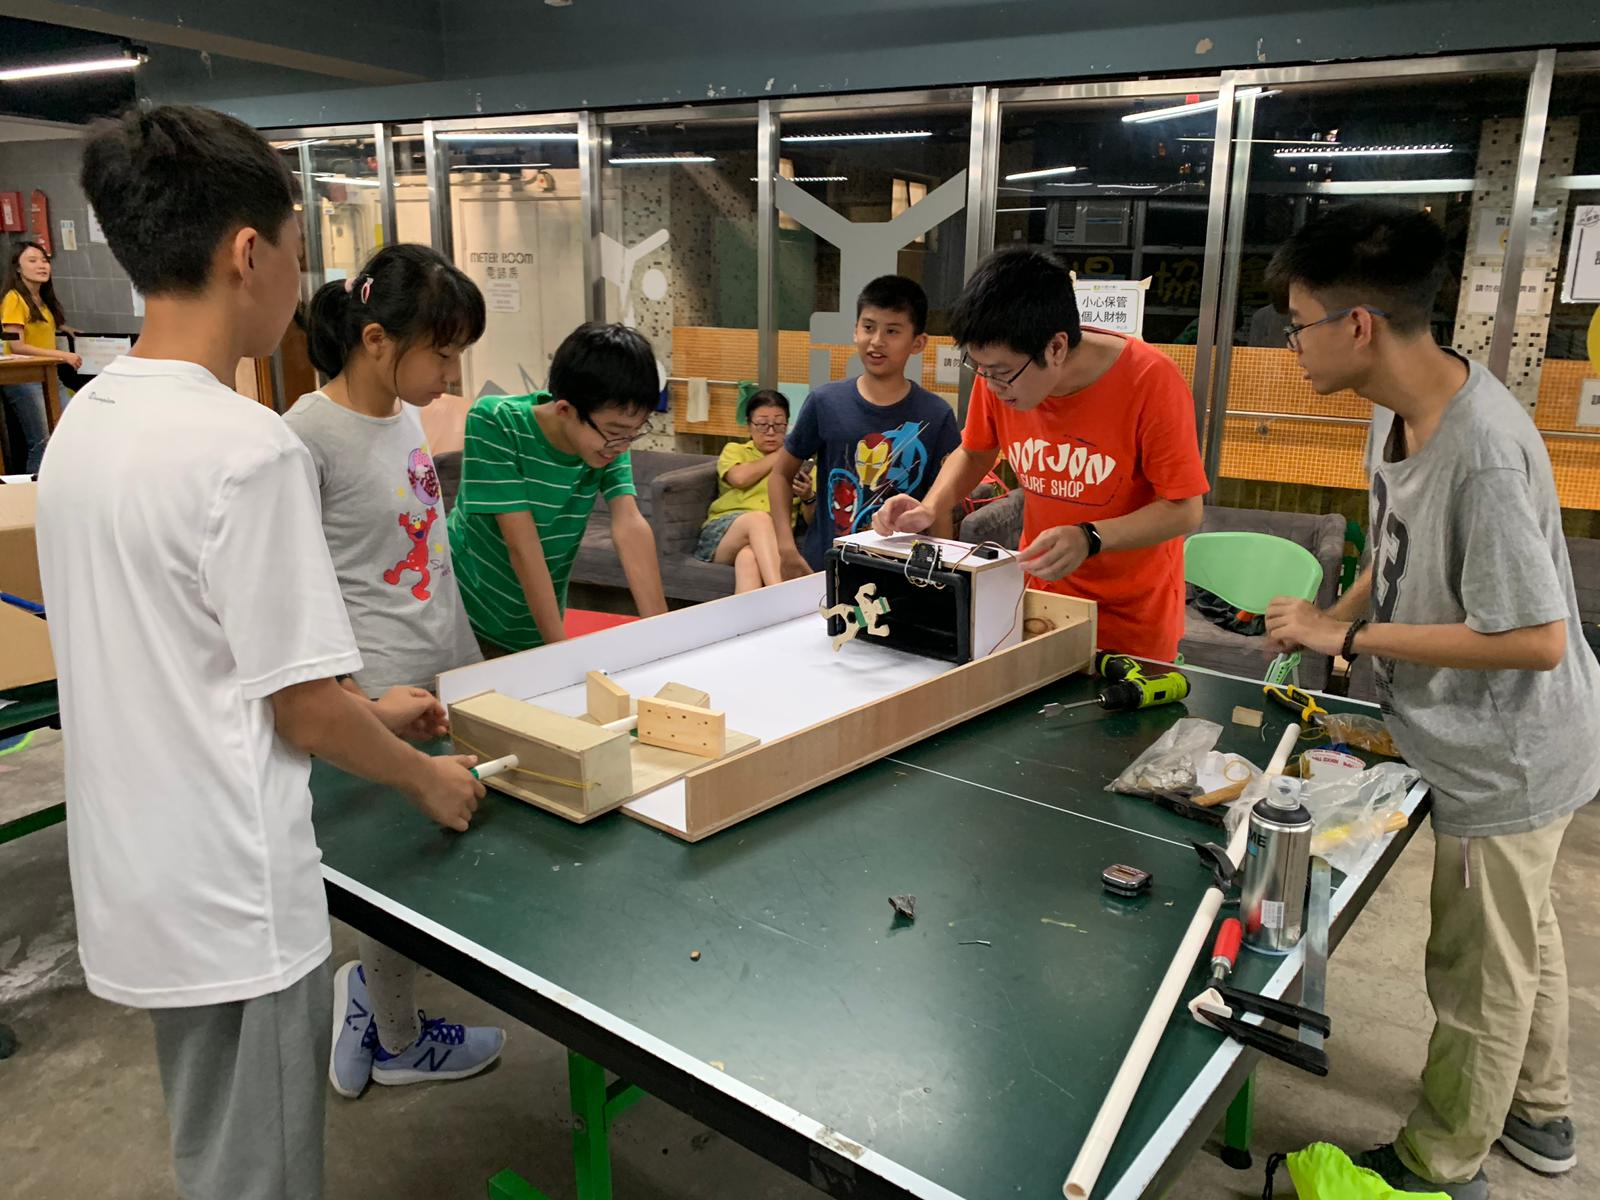 HKPA soccer scoring machine workshop 1